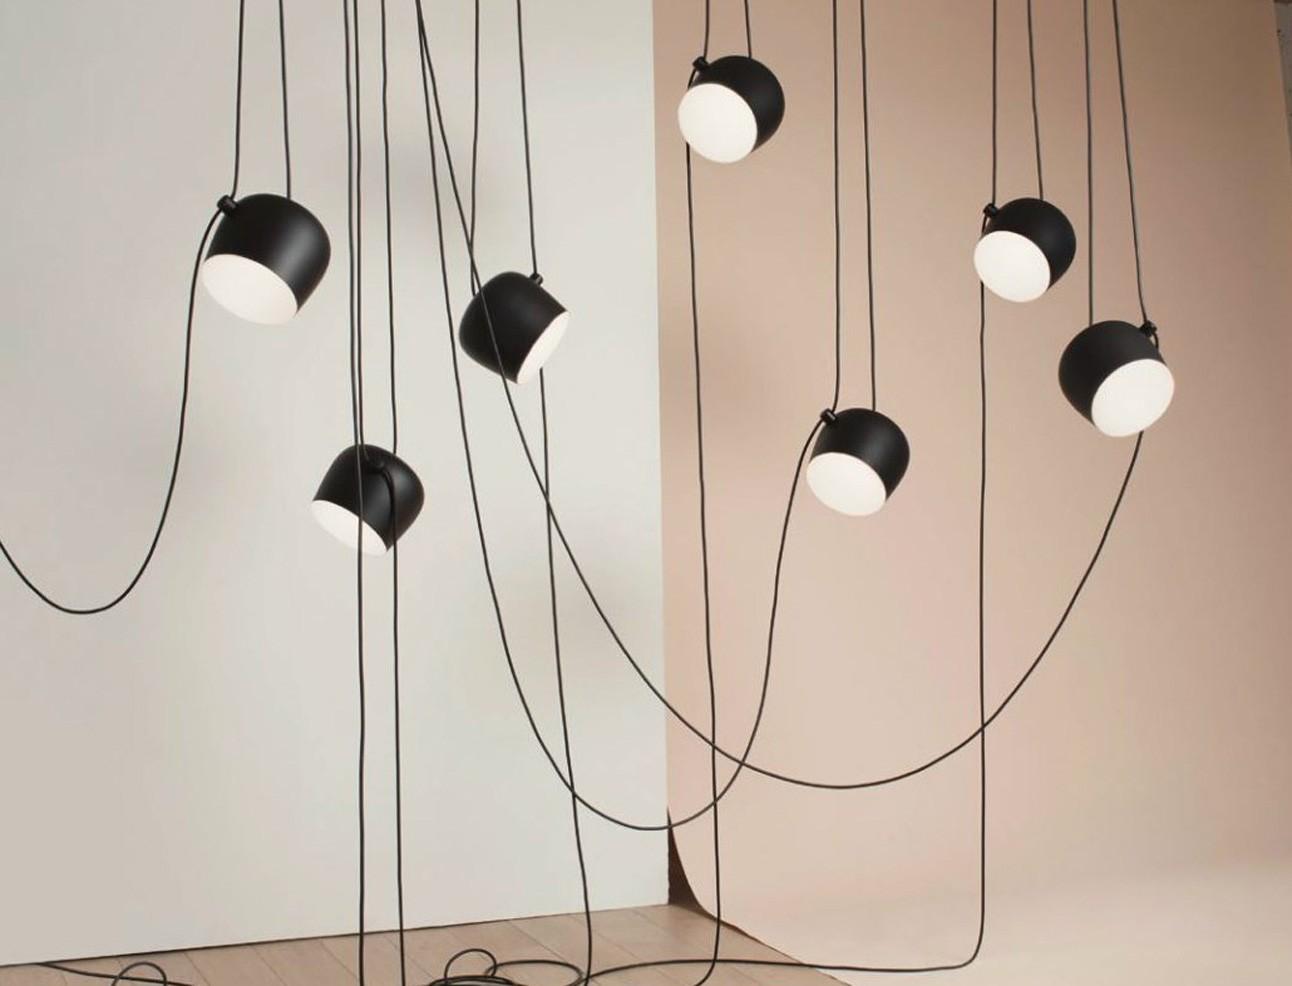 Flos Plafoniera Led : Aim lampada a sospensione flos acquista online deplain